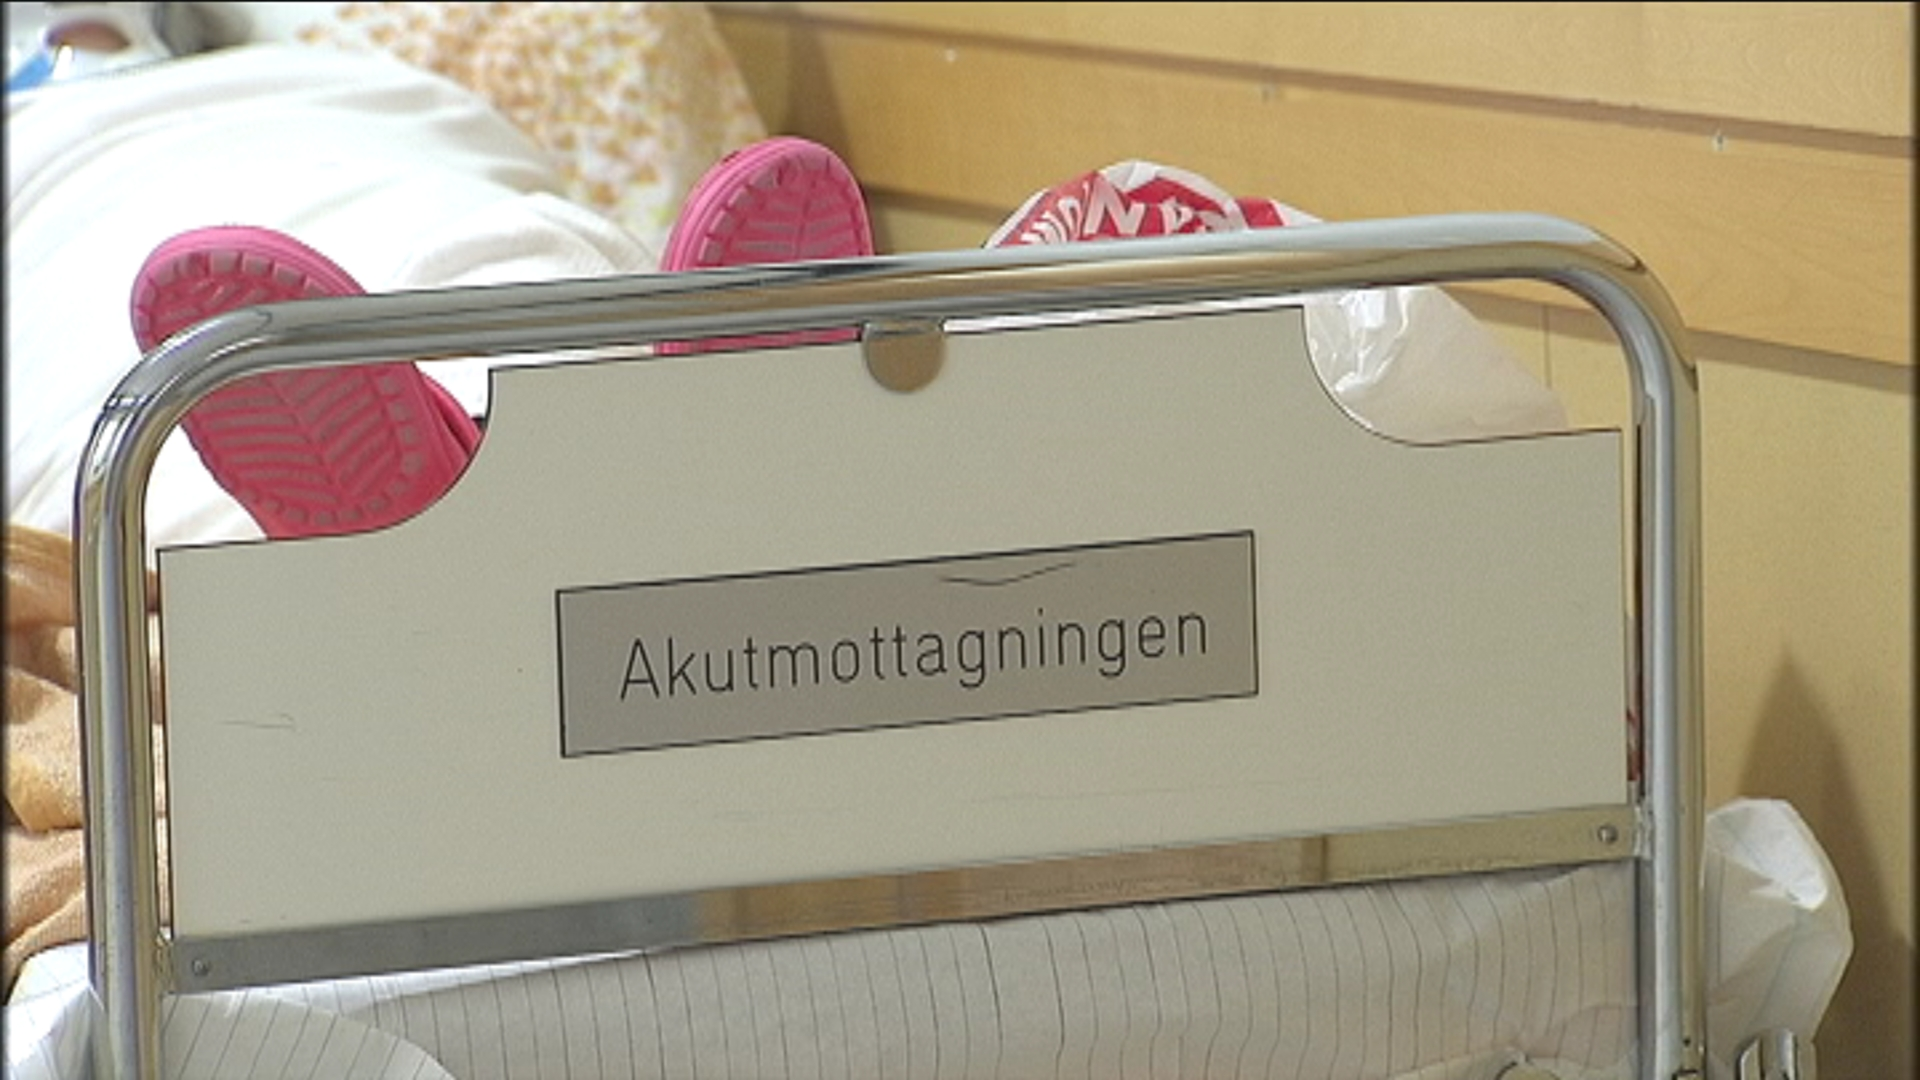 Patienter i fara pa overfulla sjukhus